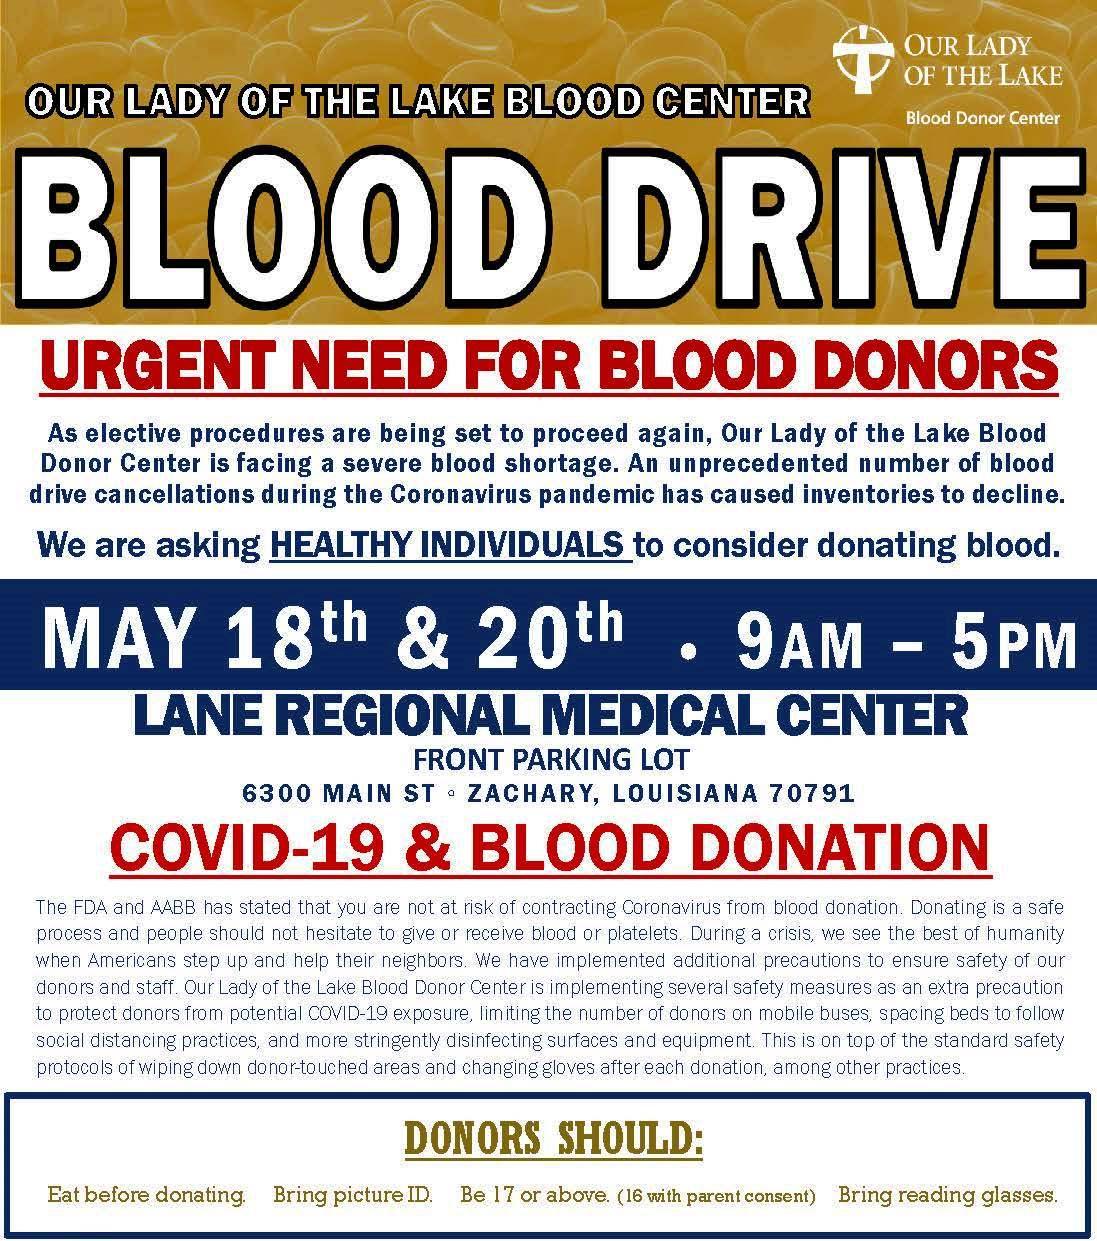 Urgent Need Blood Drive at Lane Regional